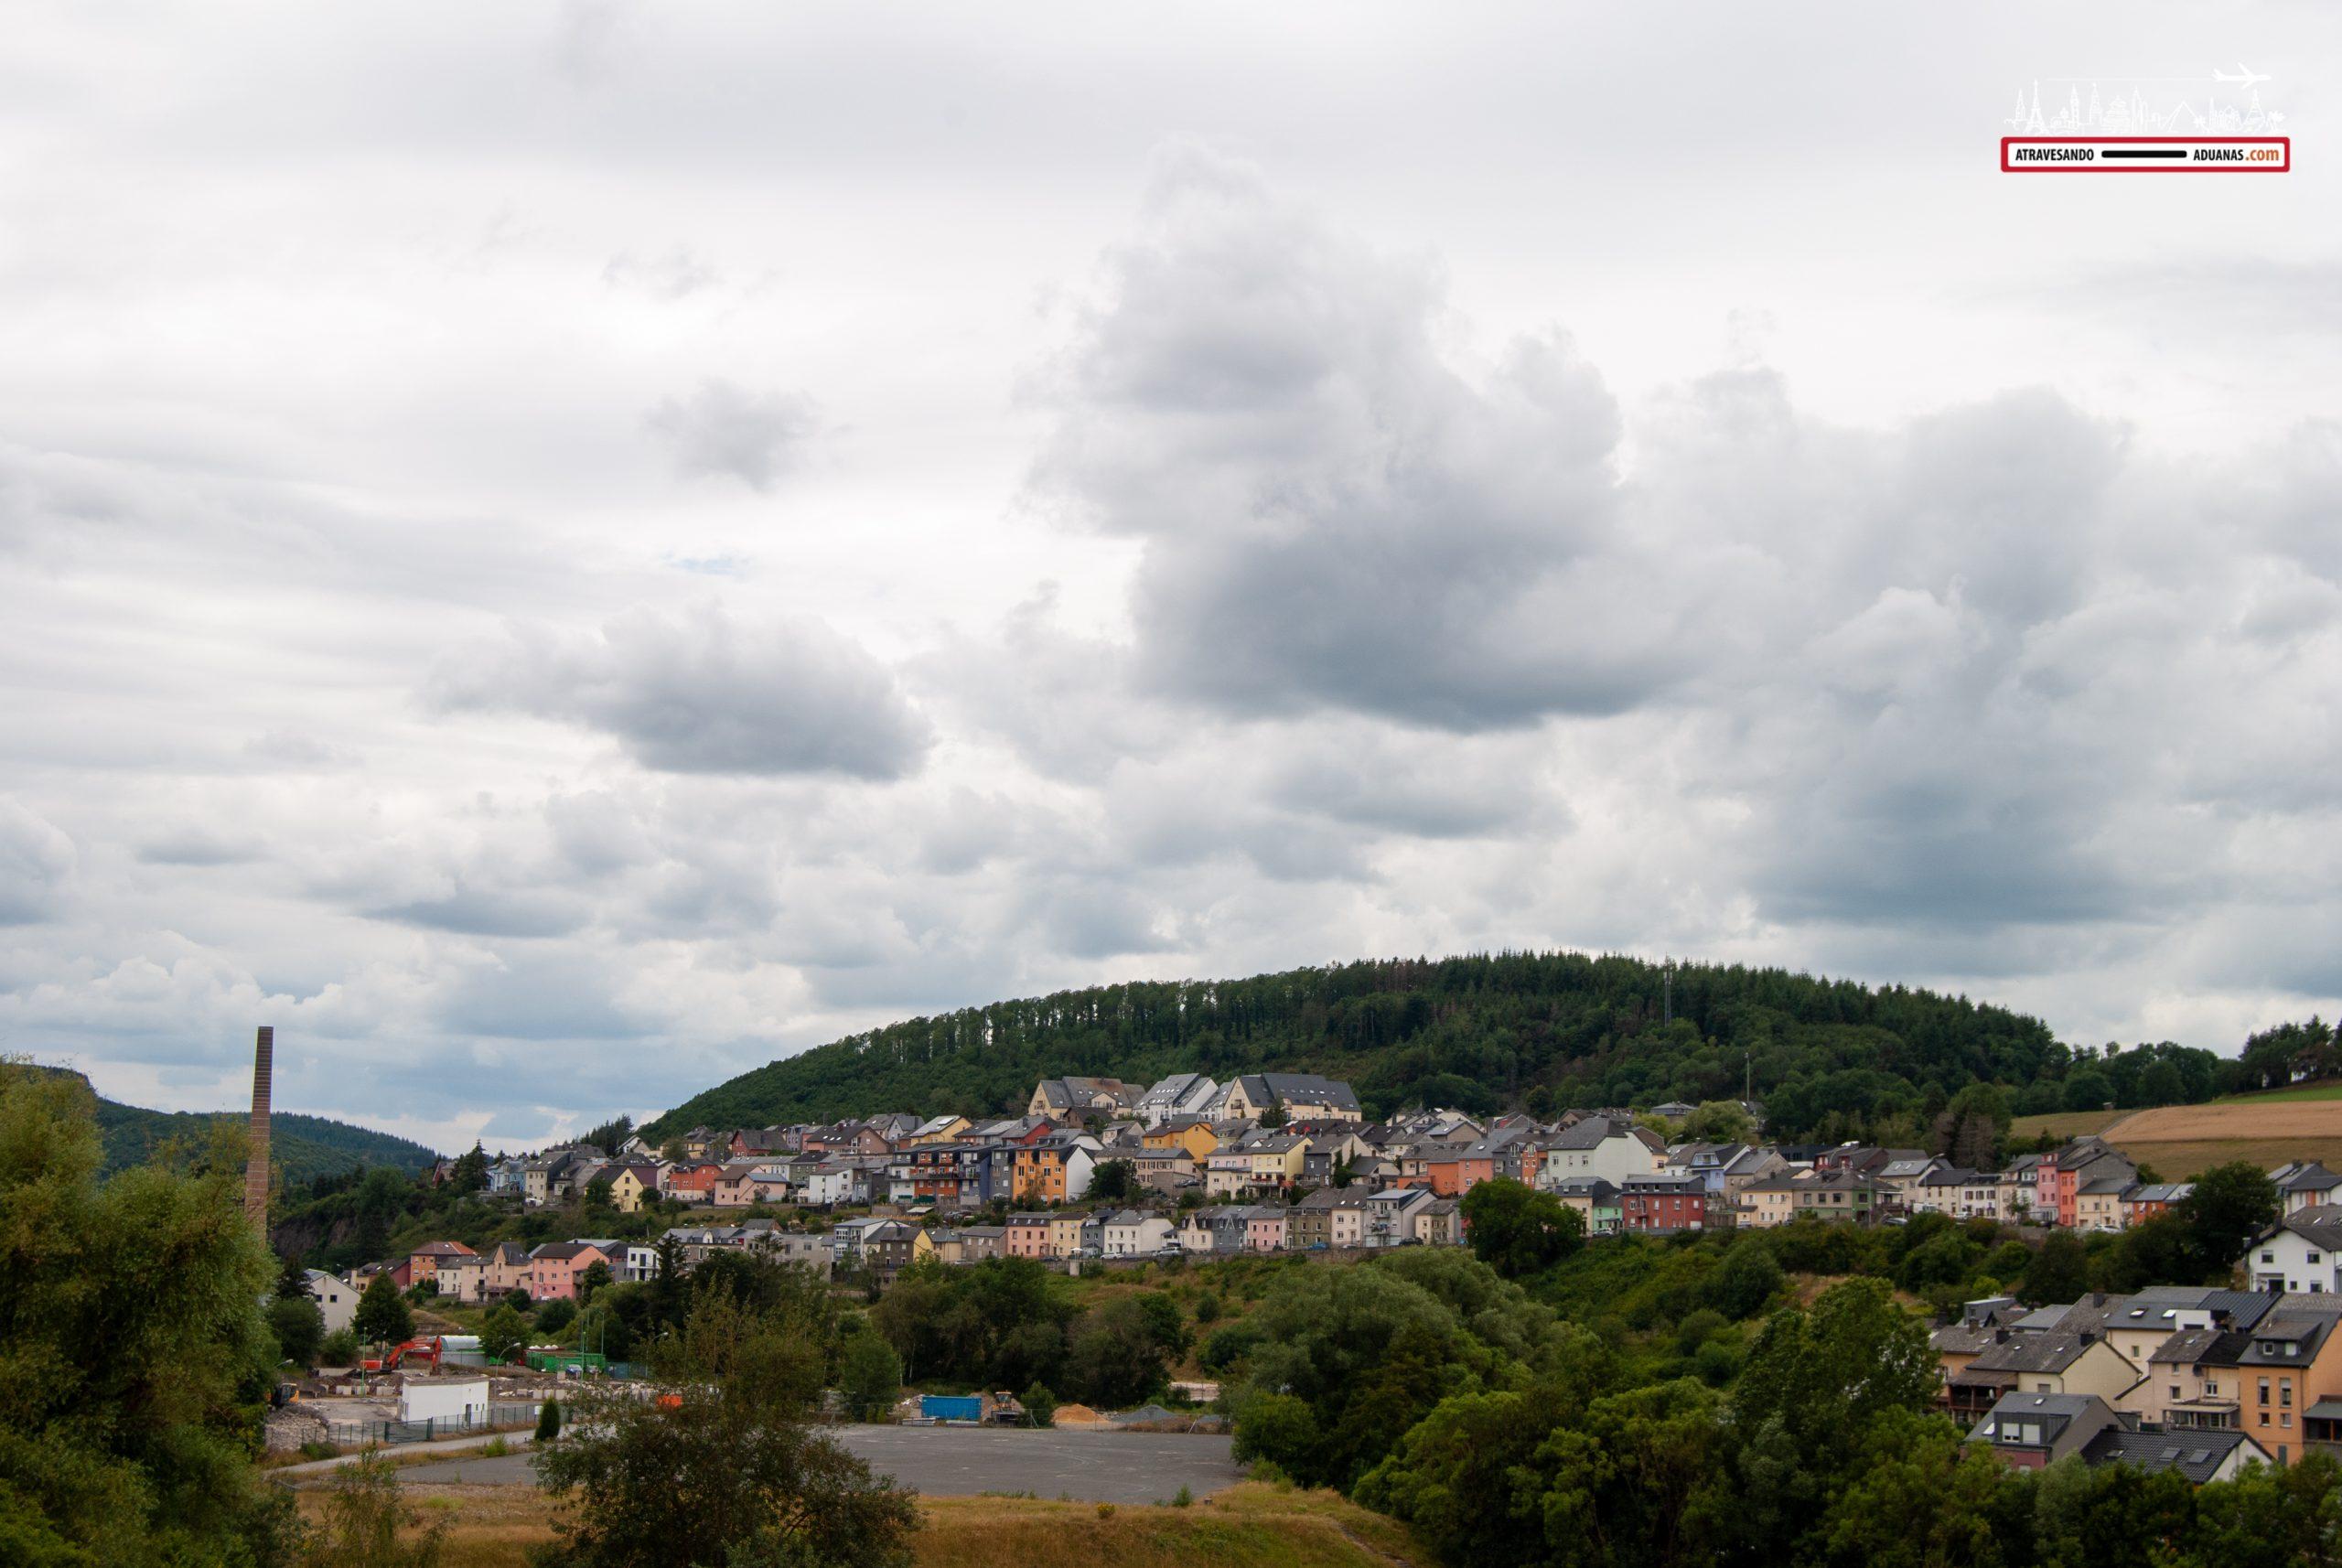 Casitas de colores en Wiltz, Luxemburgo